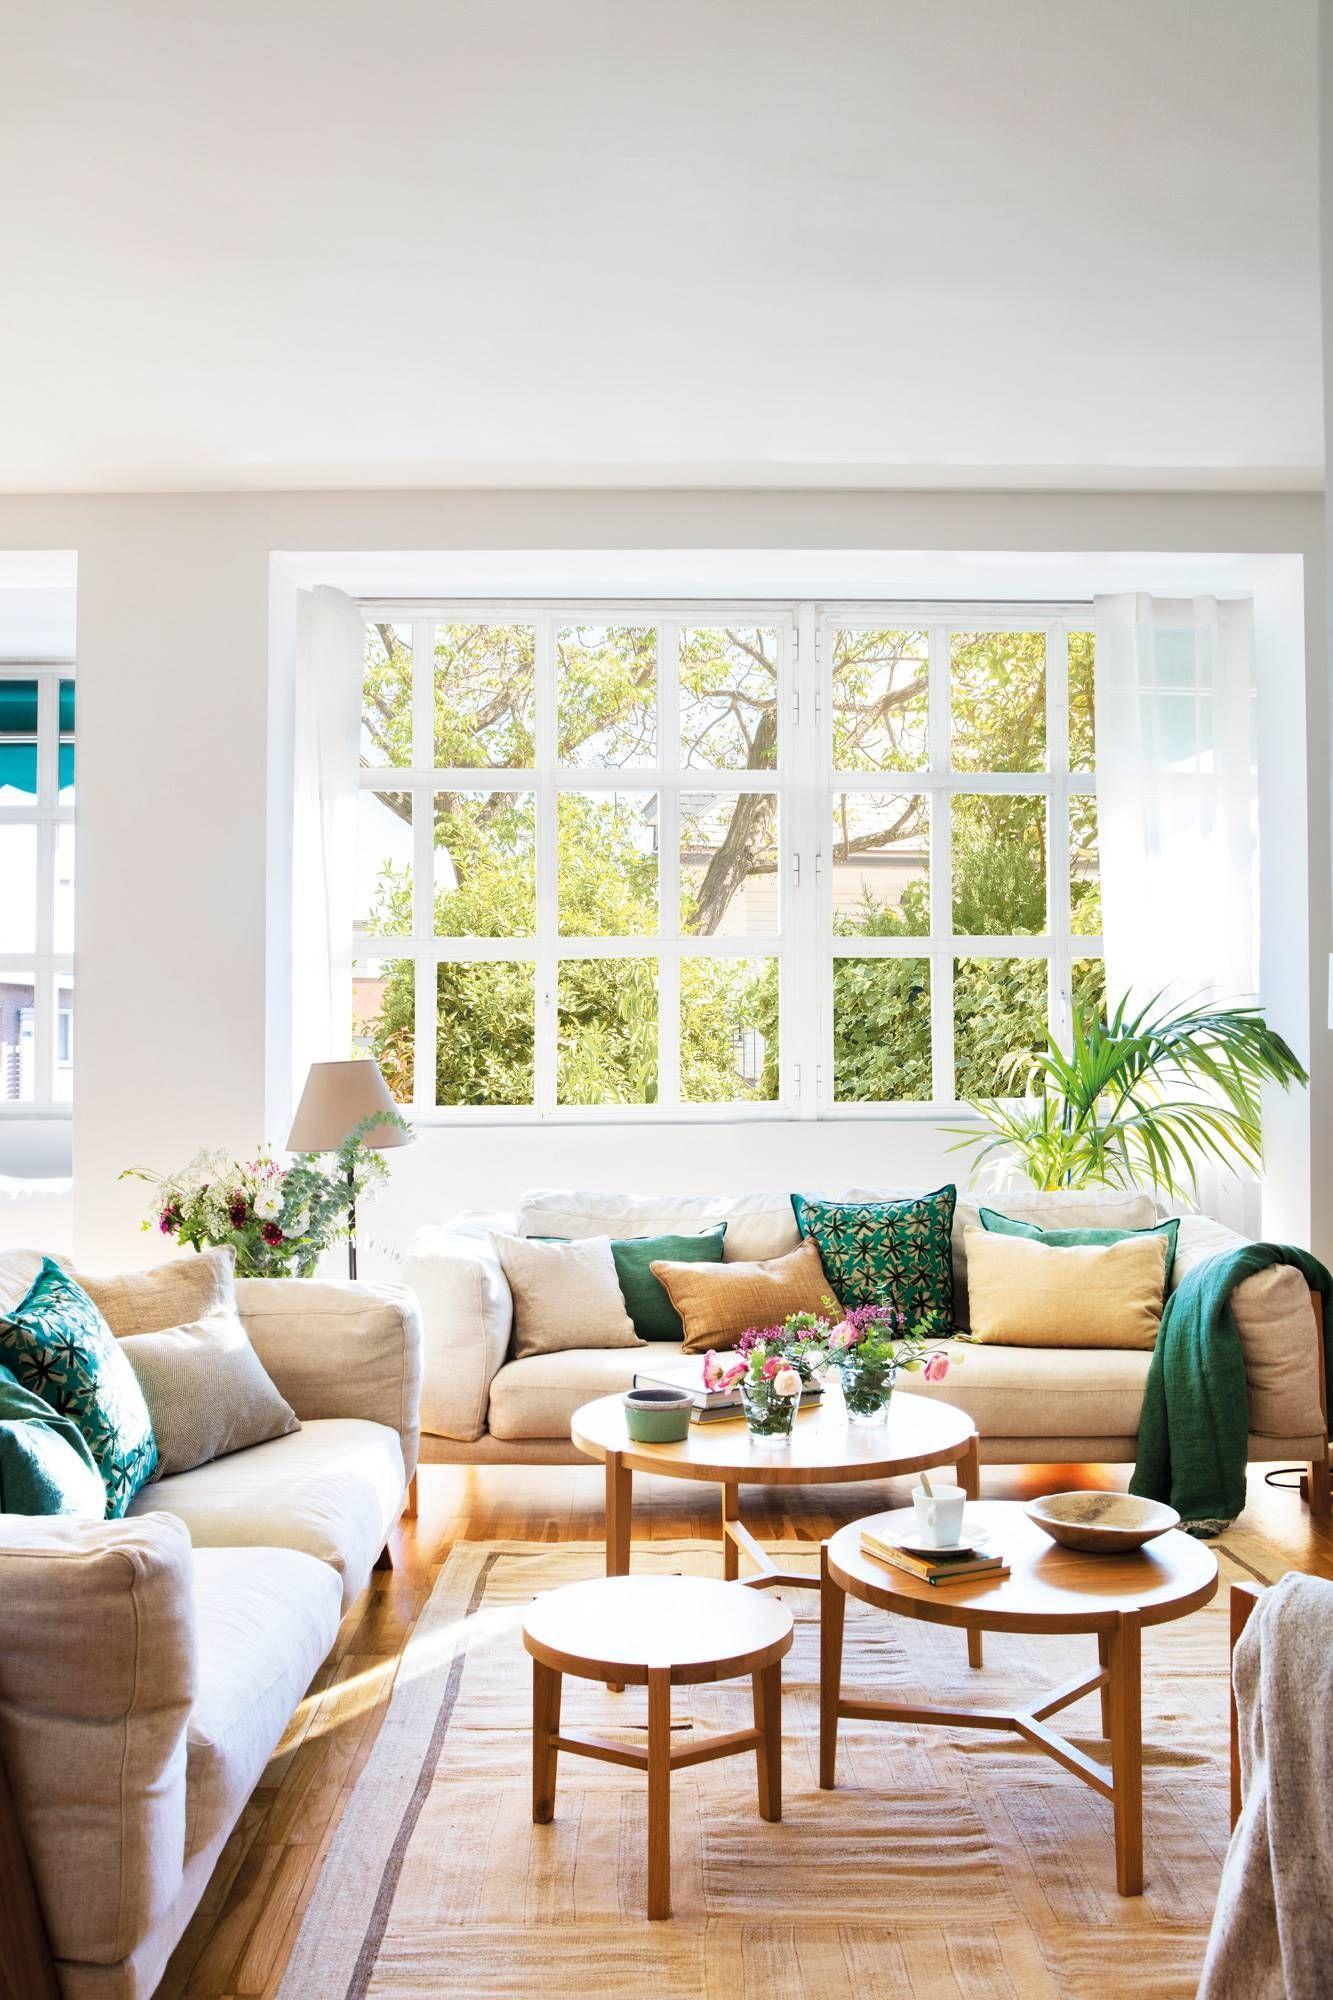 Gothic Home Decor 50 ideas para decorar tu saln de primavera.Gothic Home Decor  50 ideas para decorar tu saln de primavera #gothichome